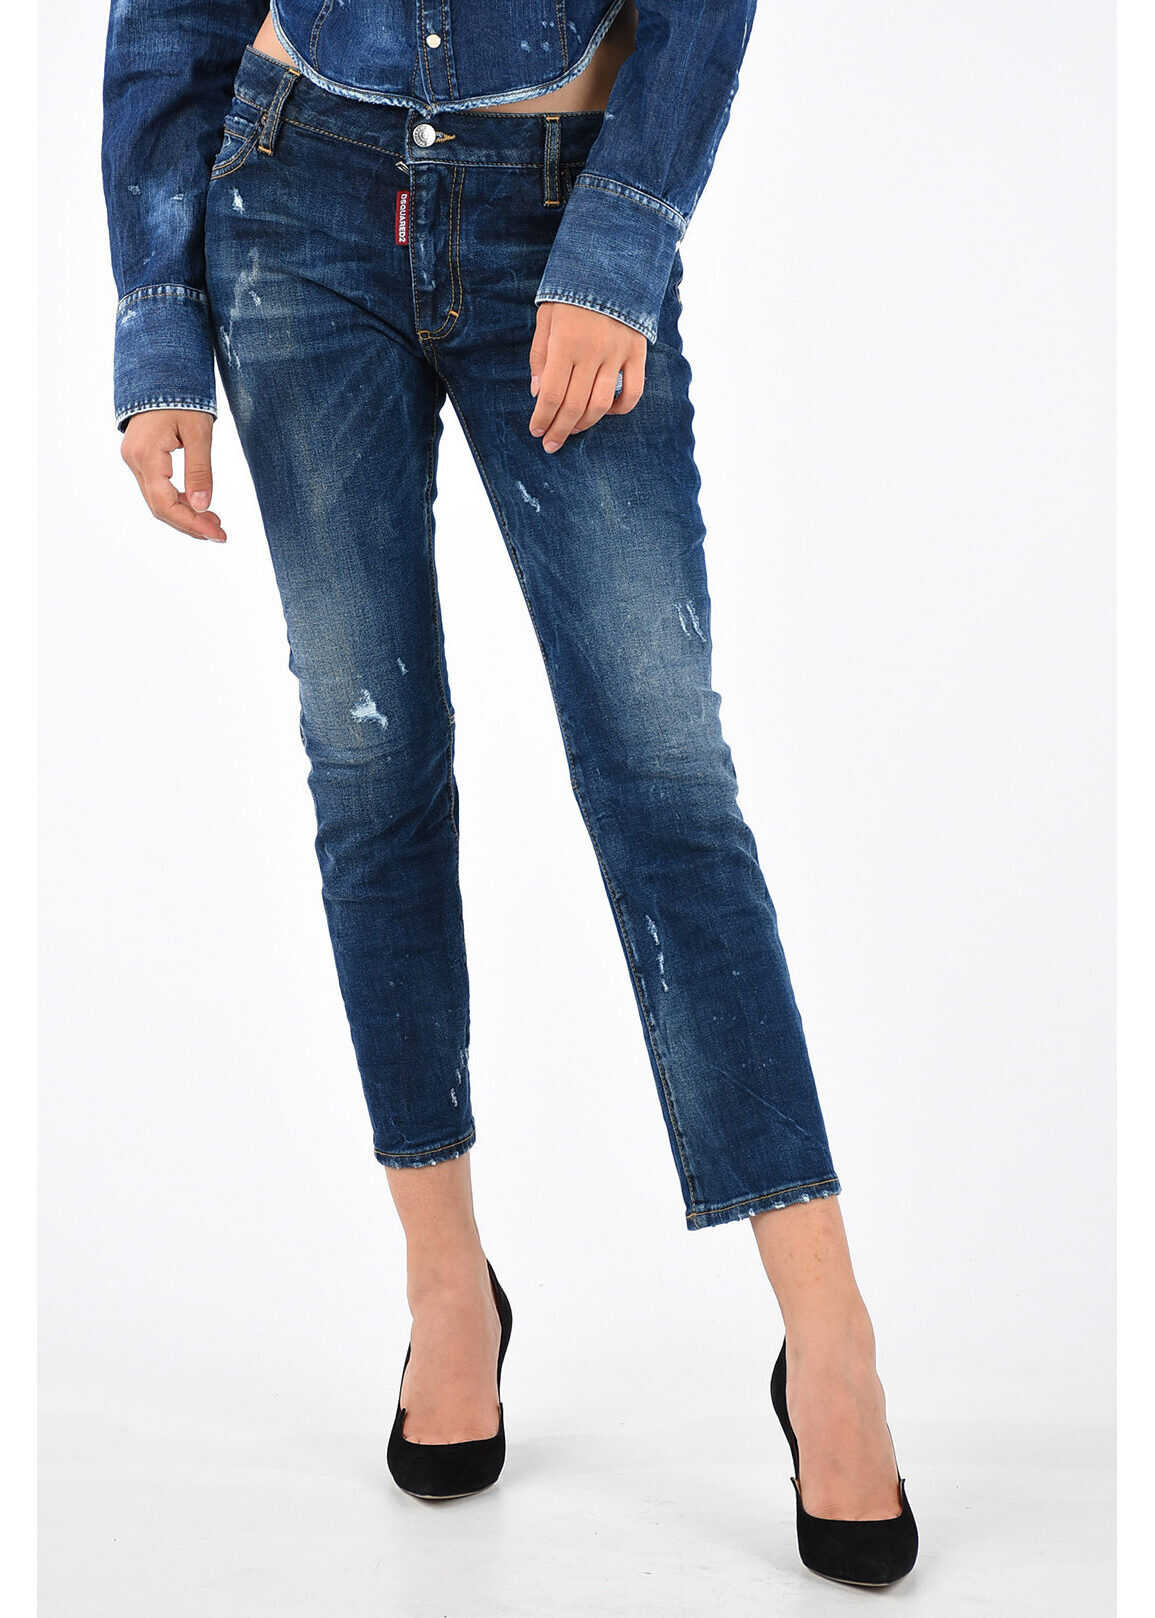 DSQUARED2 18cm Stretch Denim RUNWAY FLARE CROPPED Jeans BLUE